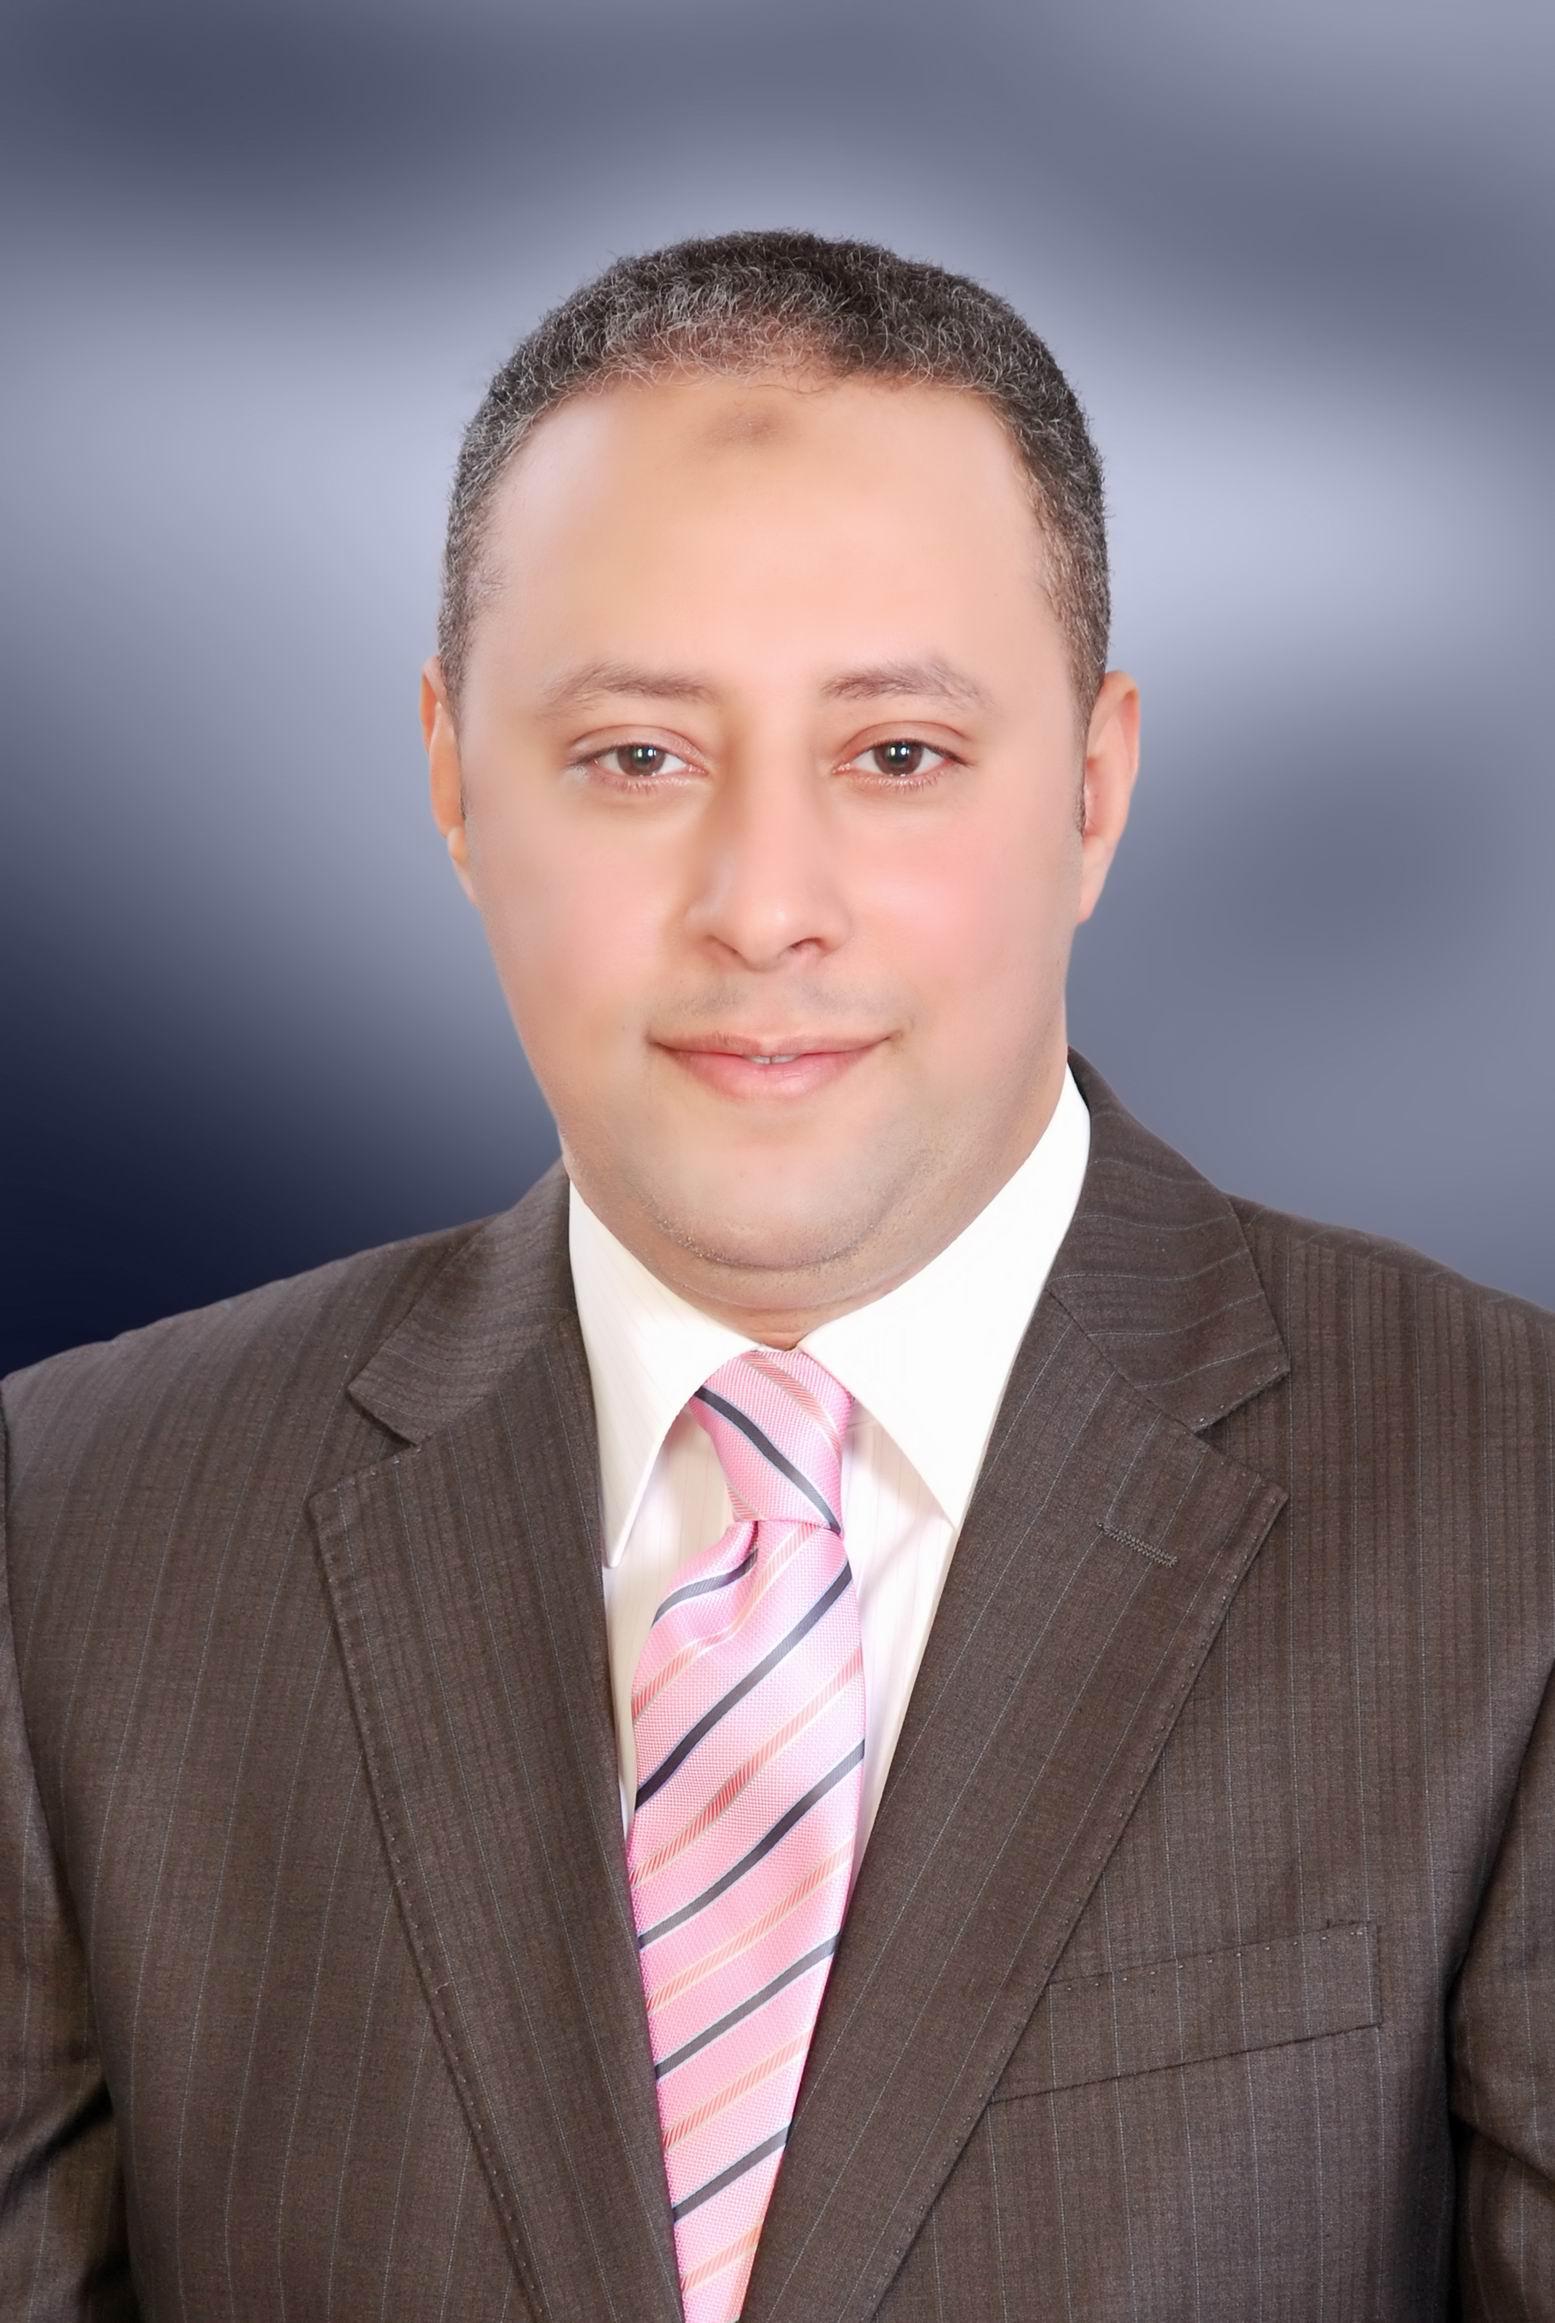 Hussein Fakhry Hozayen Metwally